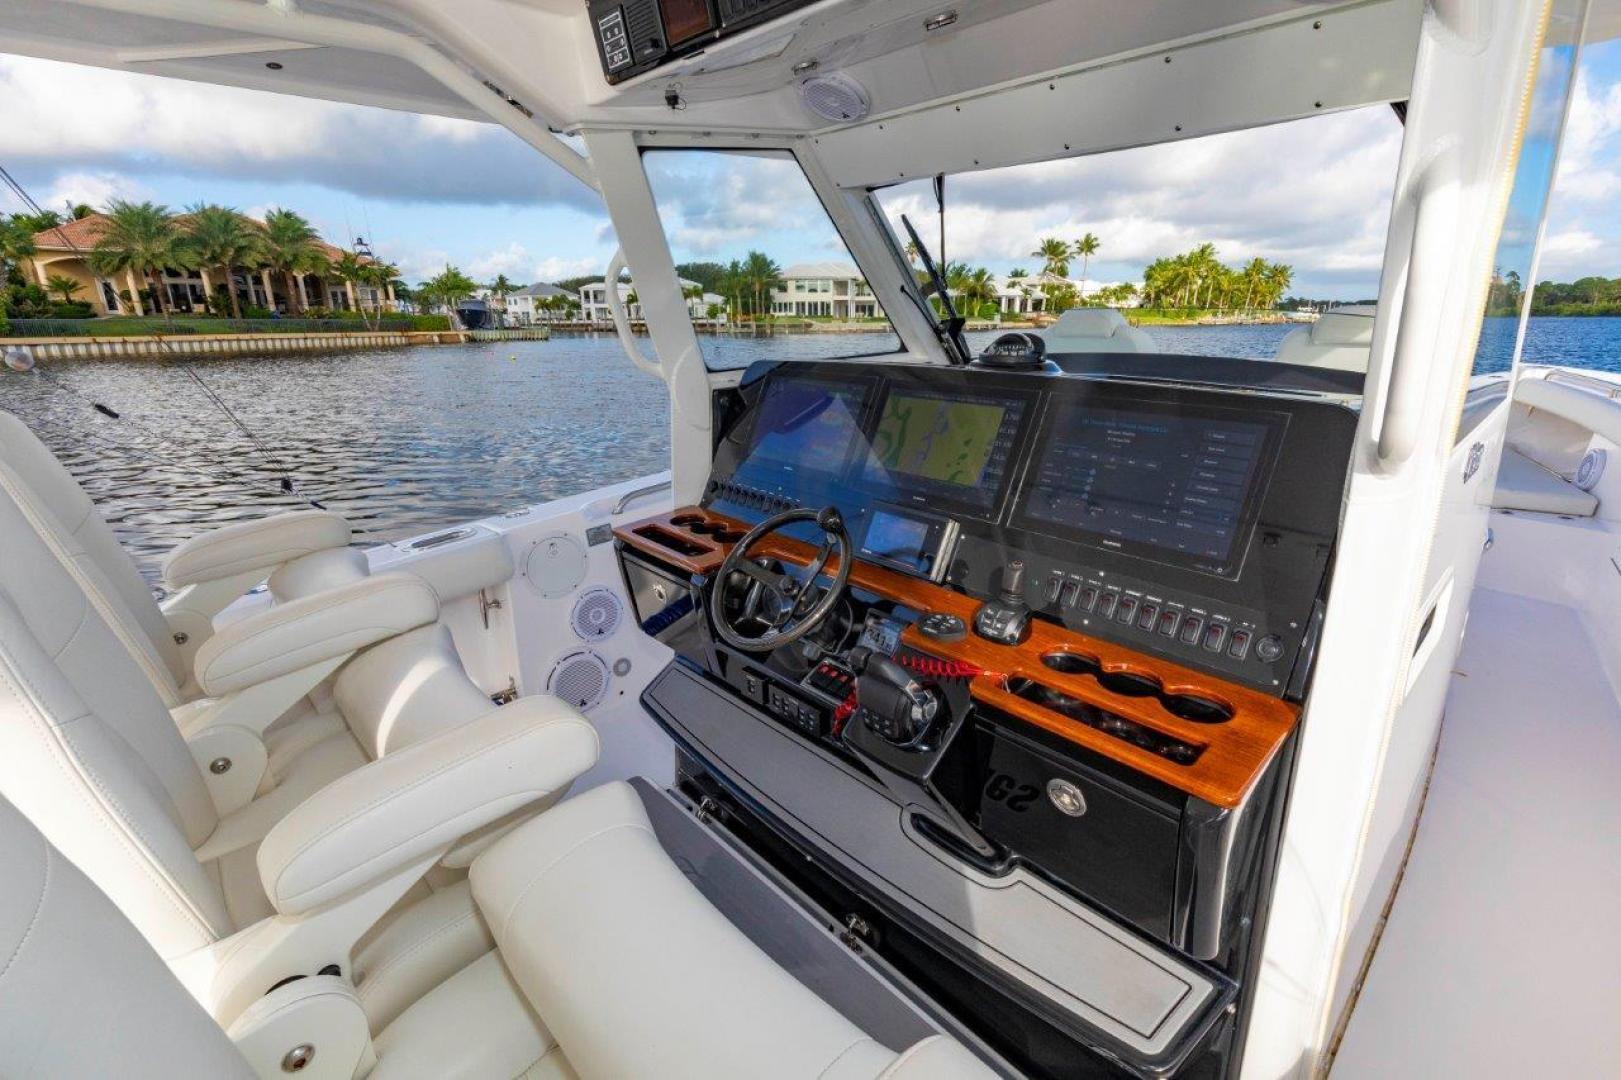 Everglades-435 Center Console 2019-Bahama Papa Palm Beach Gardens-Florida-United States-Console-1570493 | Thumbnail